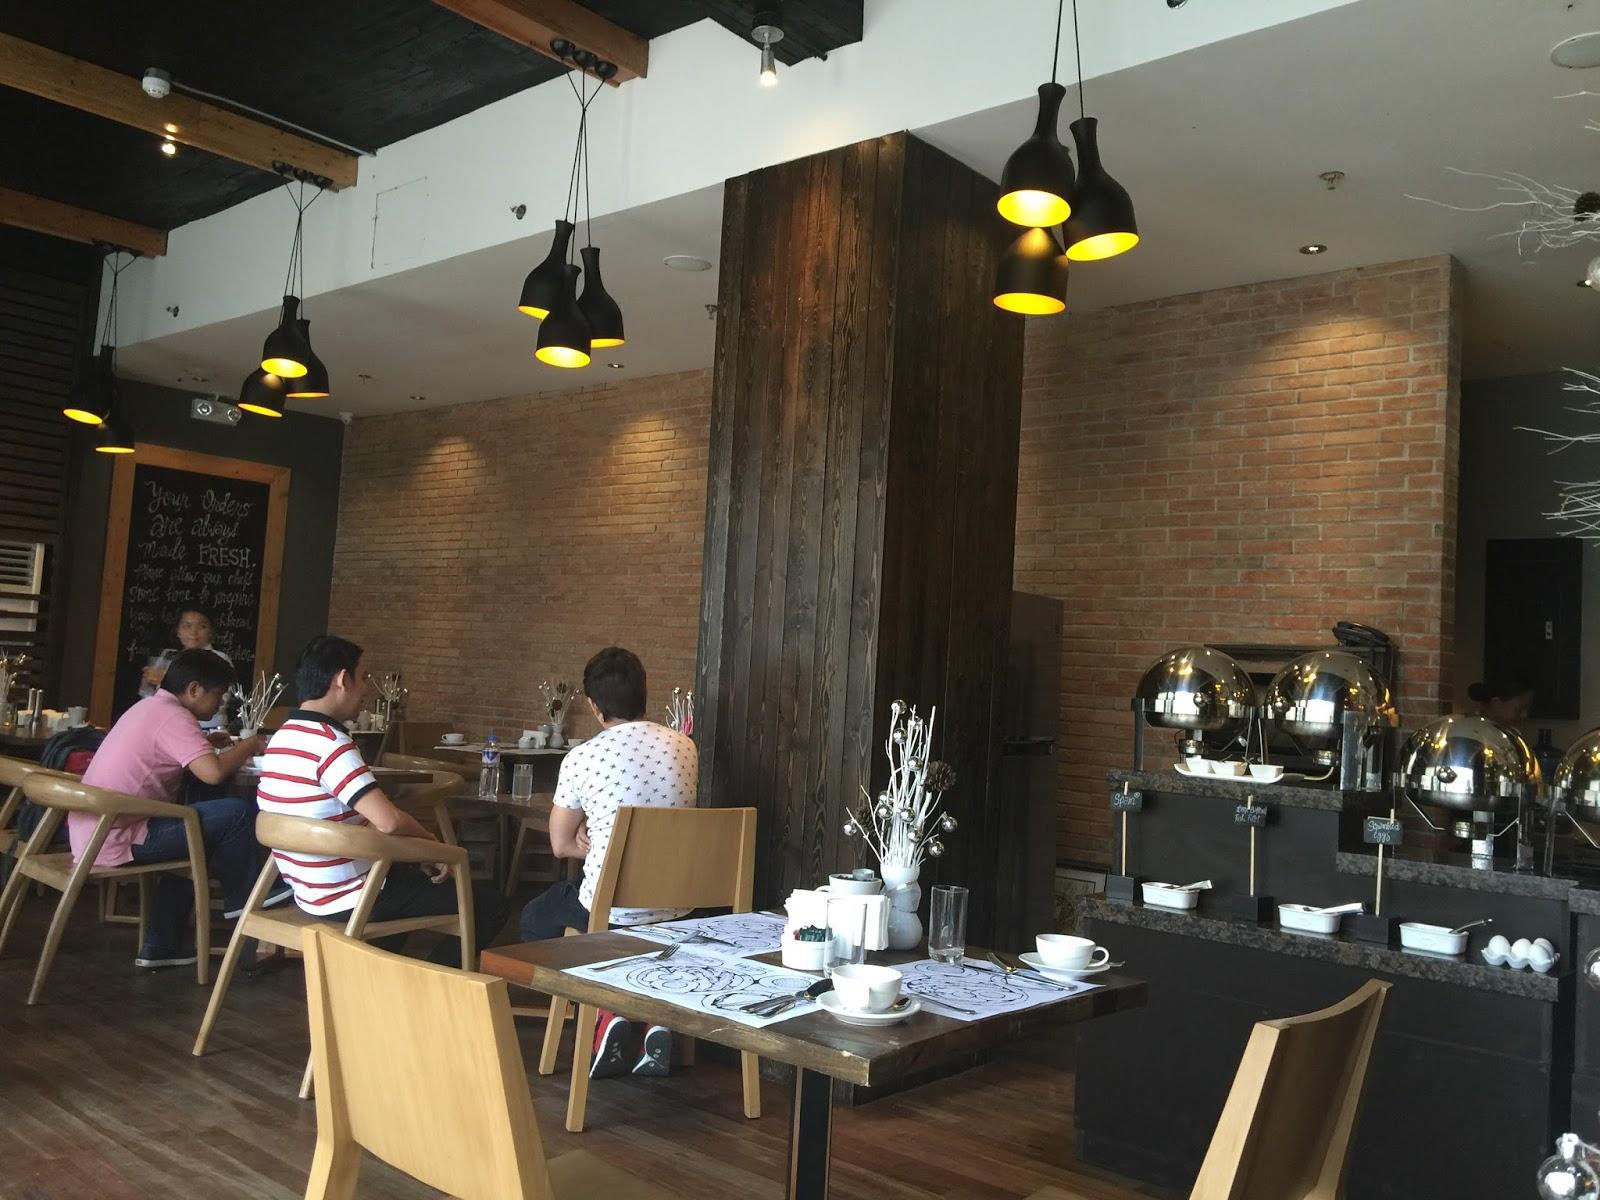 I Love Cebu: Online Travel Guide: Cuarto Hotel Restaurant Lobby